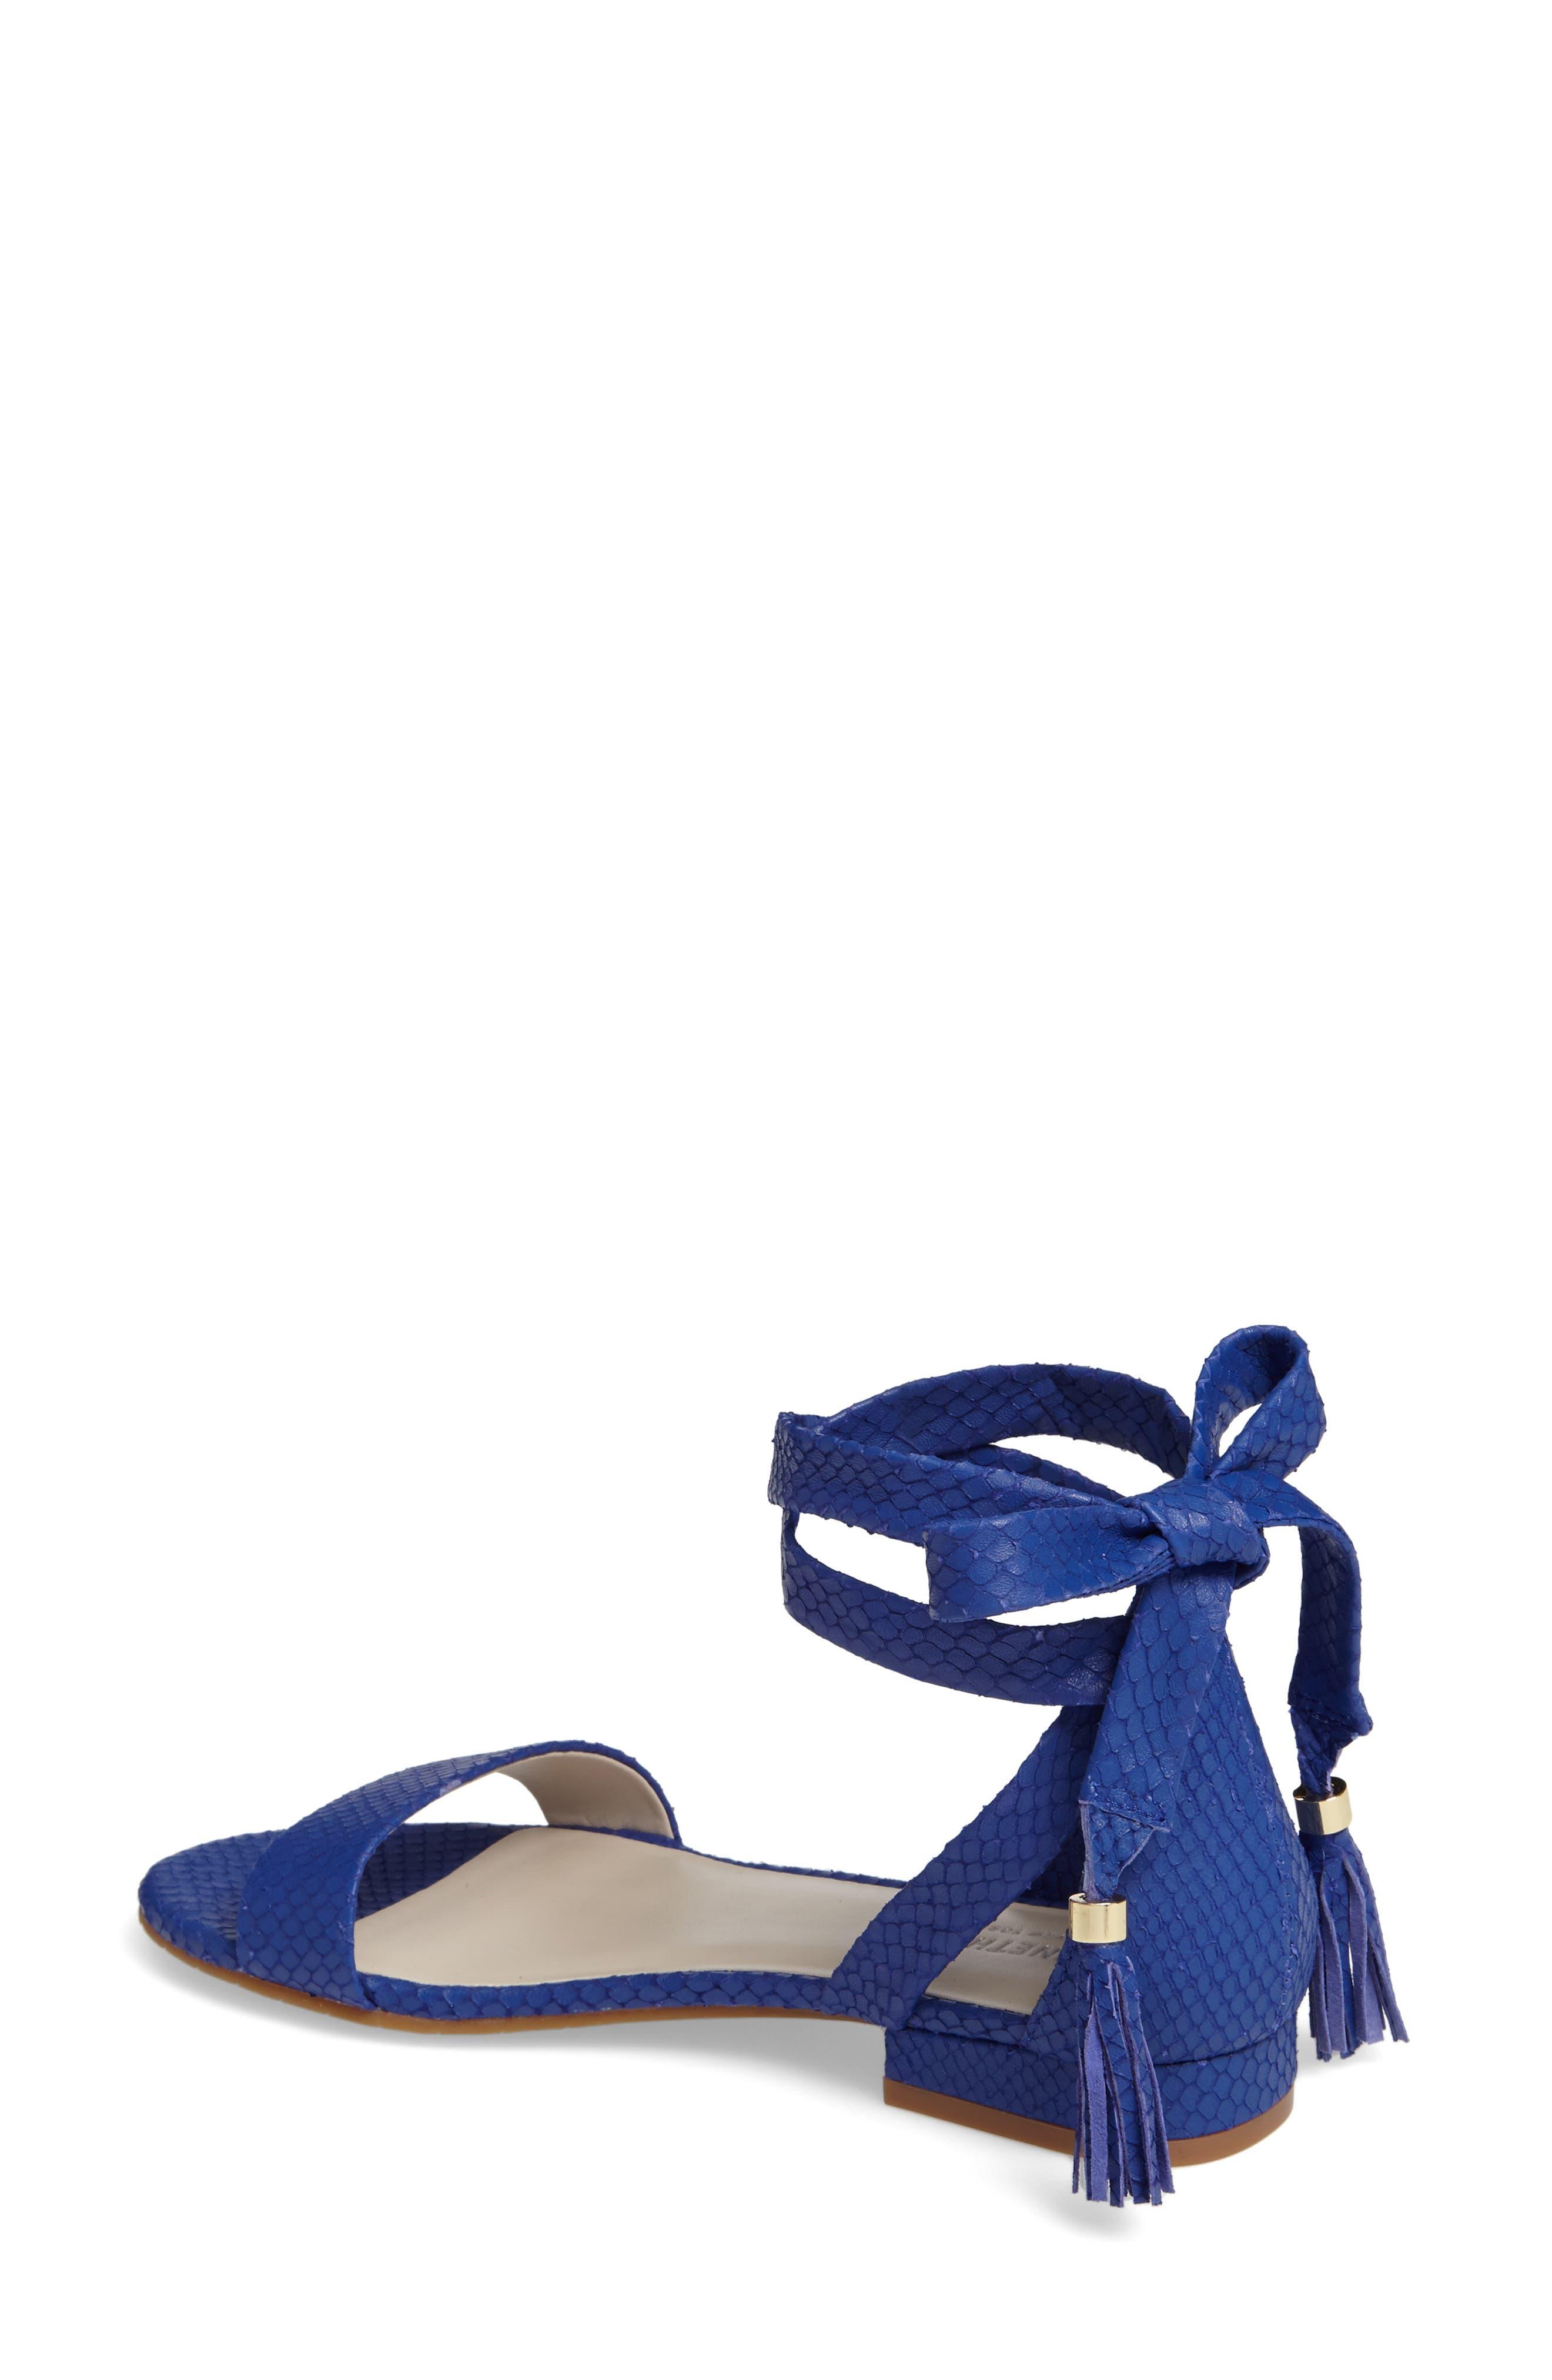 Valen Tassel Lace-Up Sandal,                             Alternate thumbnail 23, color,